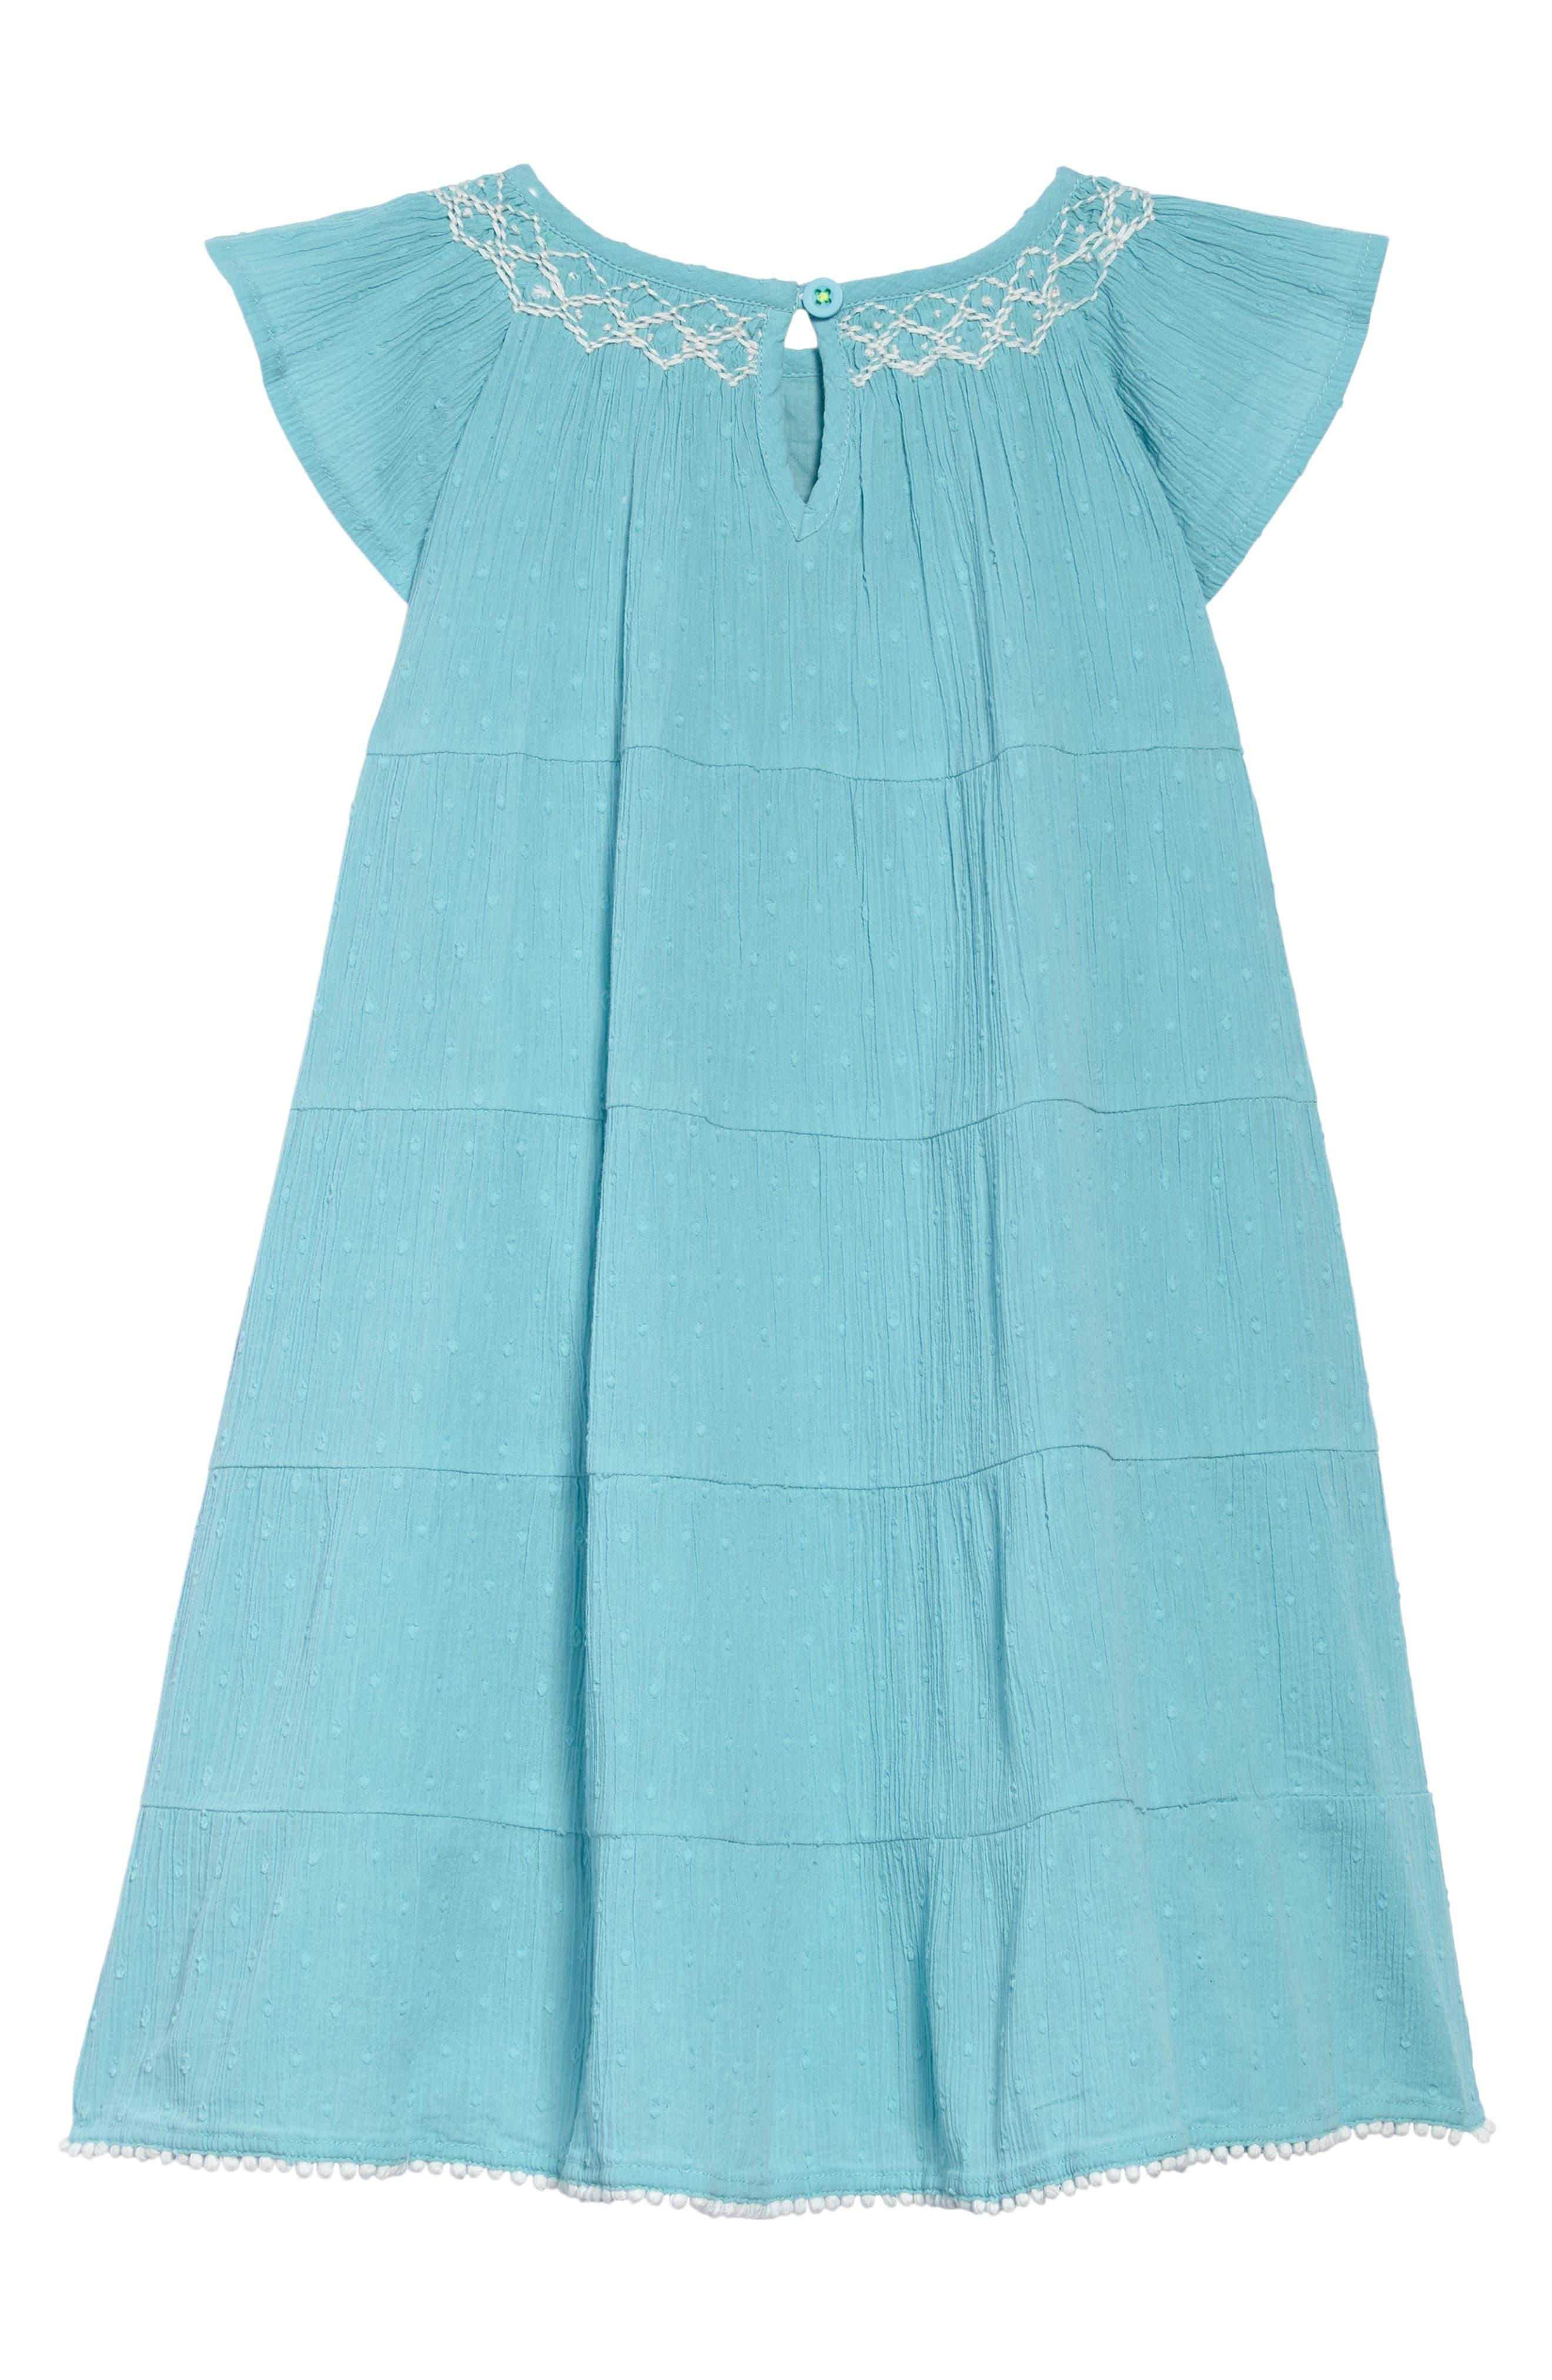 Twirly Dress,                             Alternate thumbnail 2, color,                             Camper Blue Blu